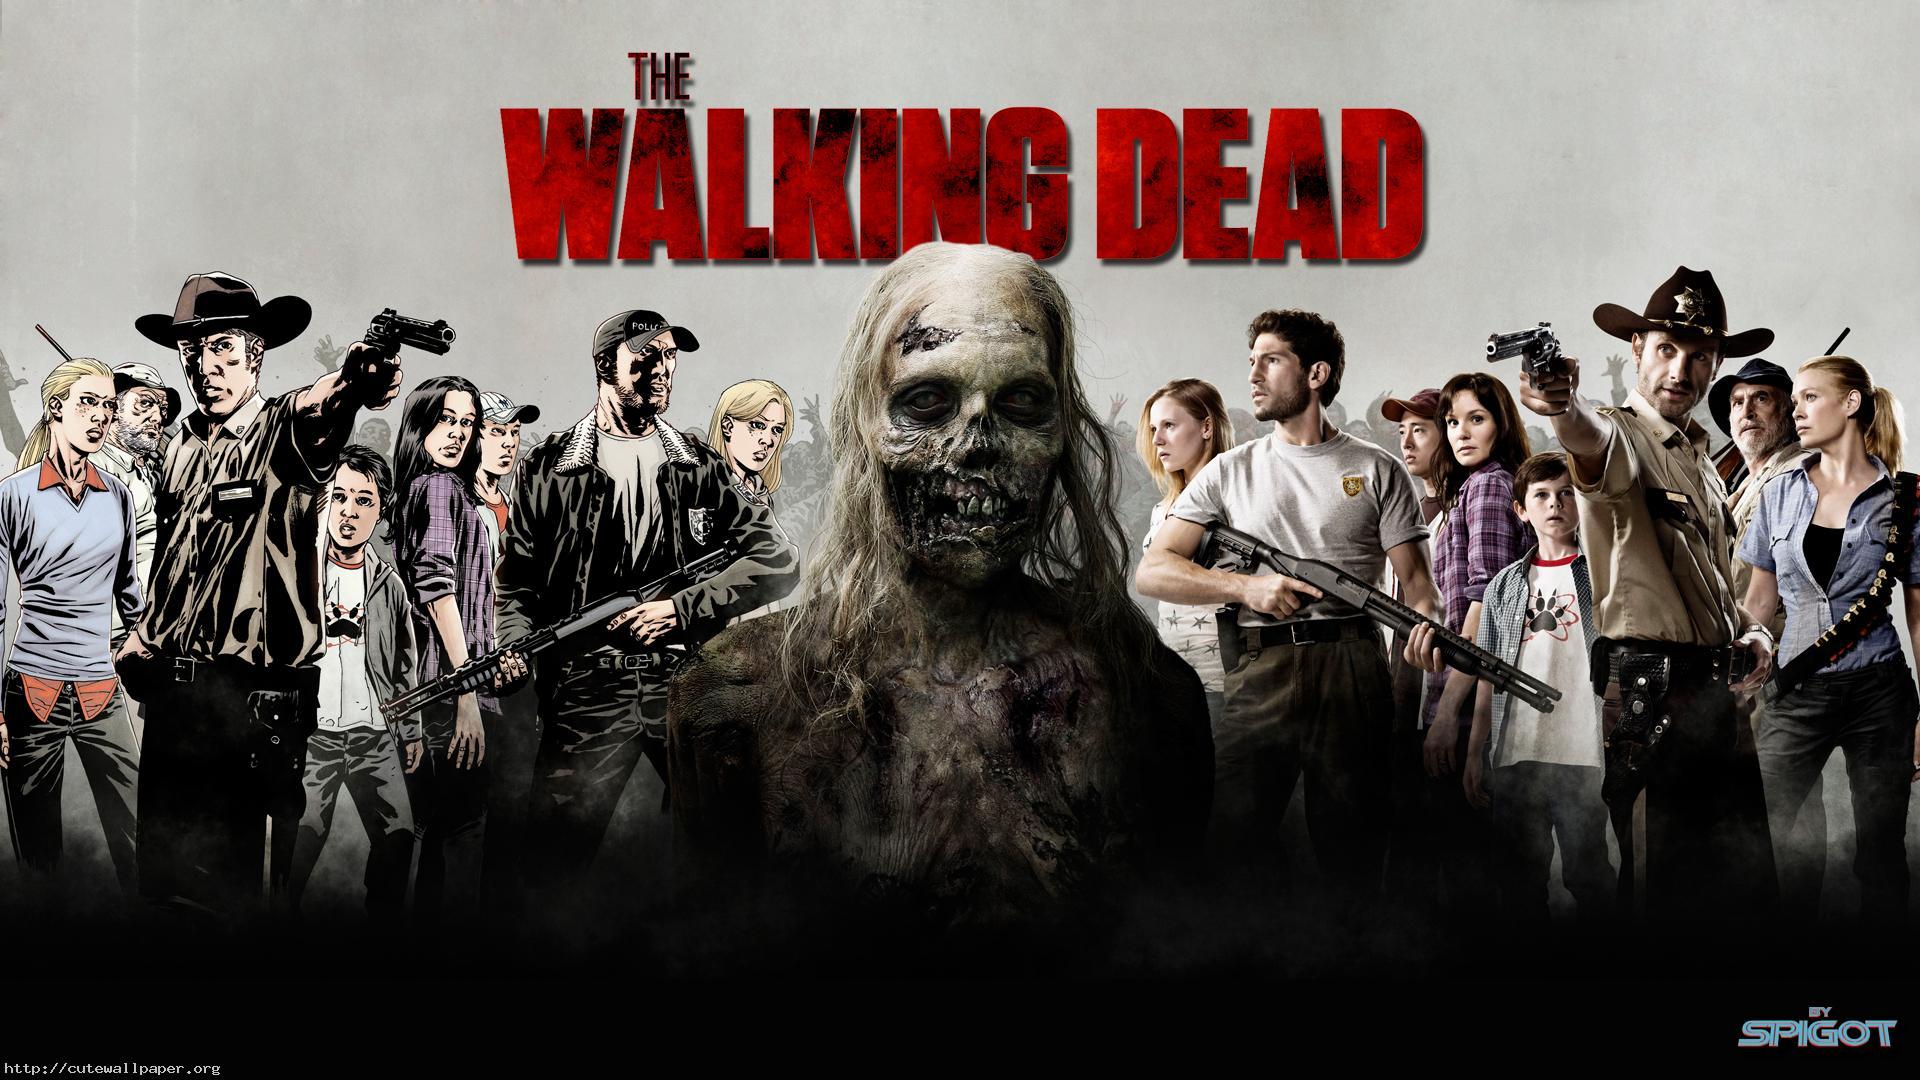 Walking Dead Hd Wallpapers 38 Wallpapers Adorable Wallpapers